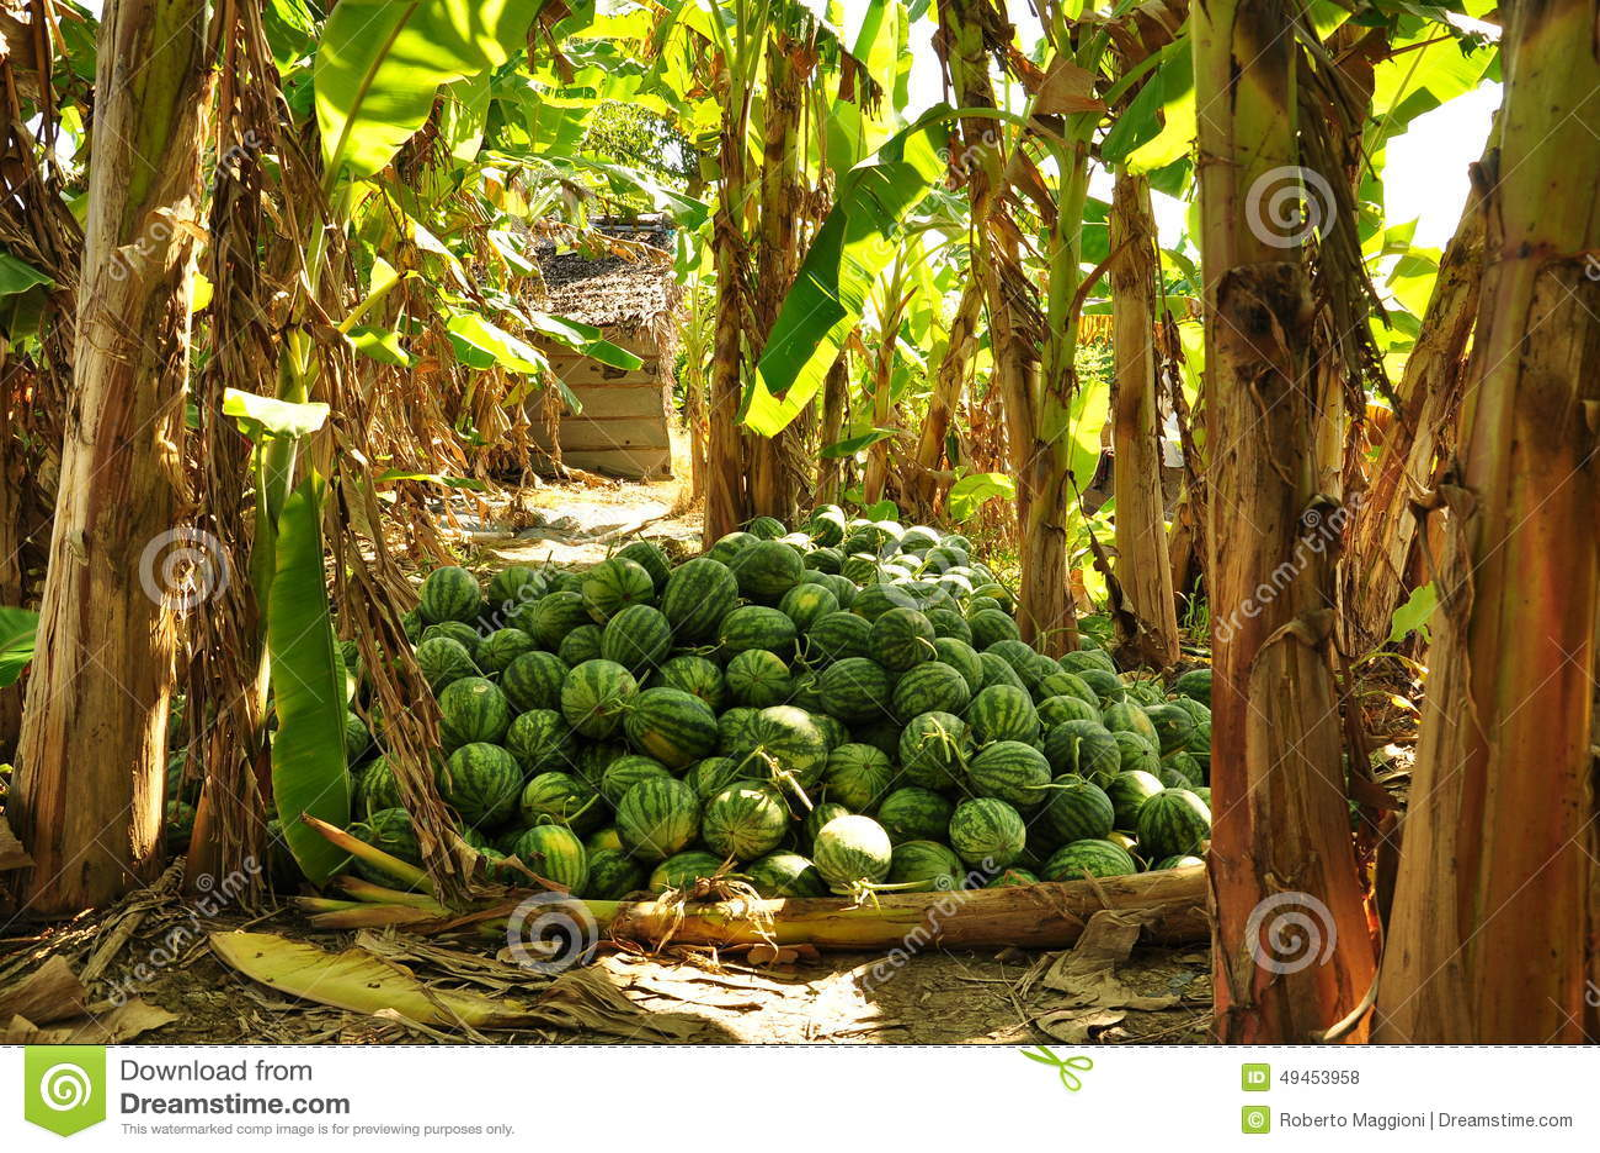 Watermelon Harvest Banana Tree Grove Vietnam Fruit Tropical Orchard Mekong Delta